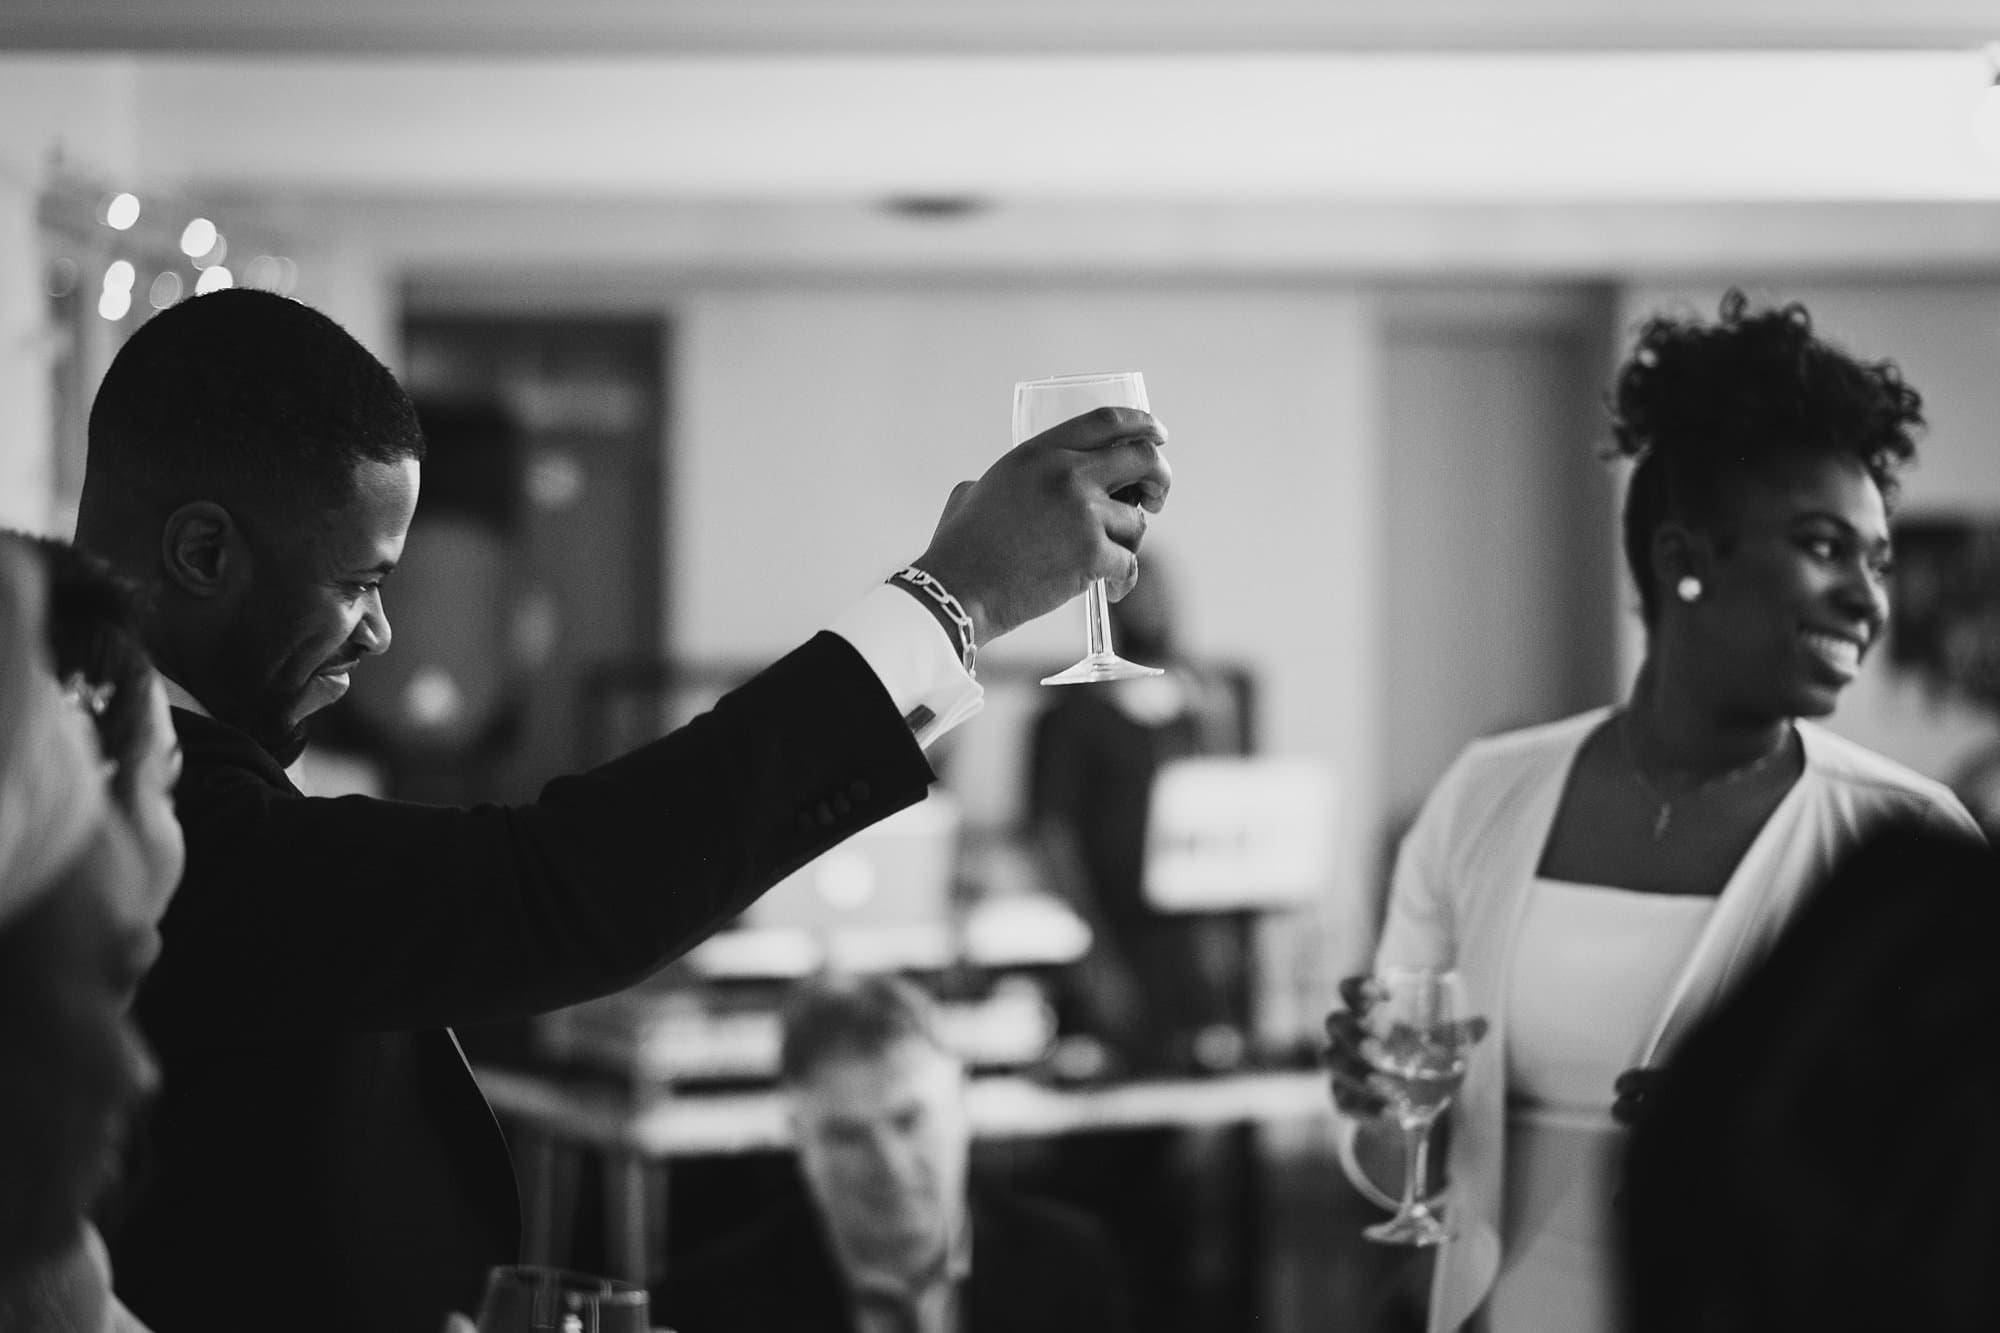 asia house london wedding photographer 038 - Rachel + Gabriel   Asia House Wedding Photography